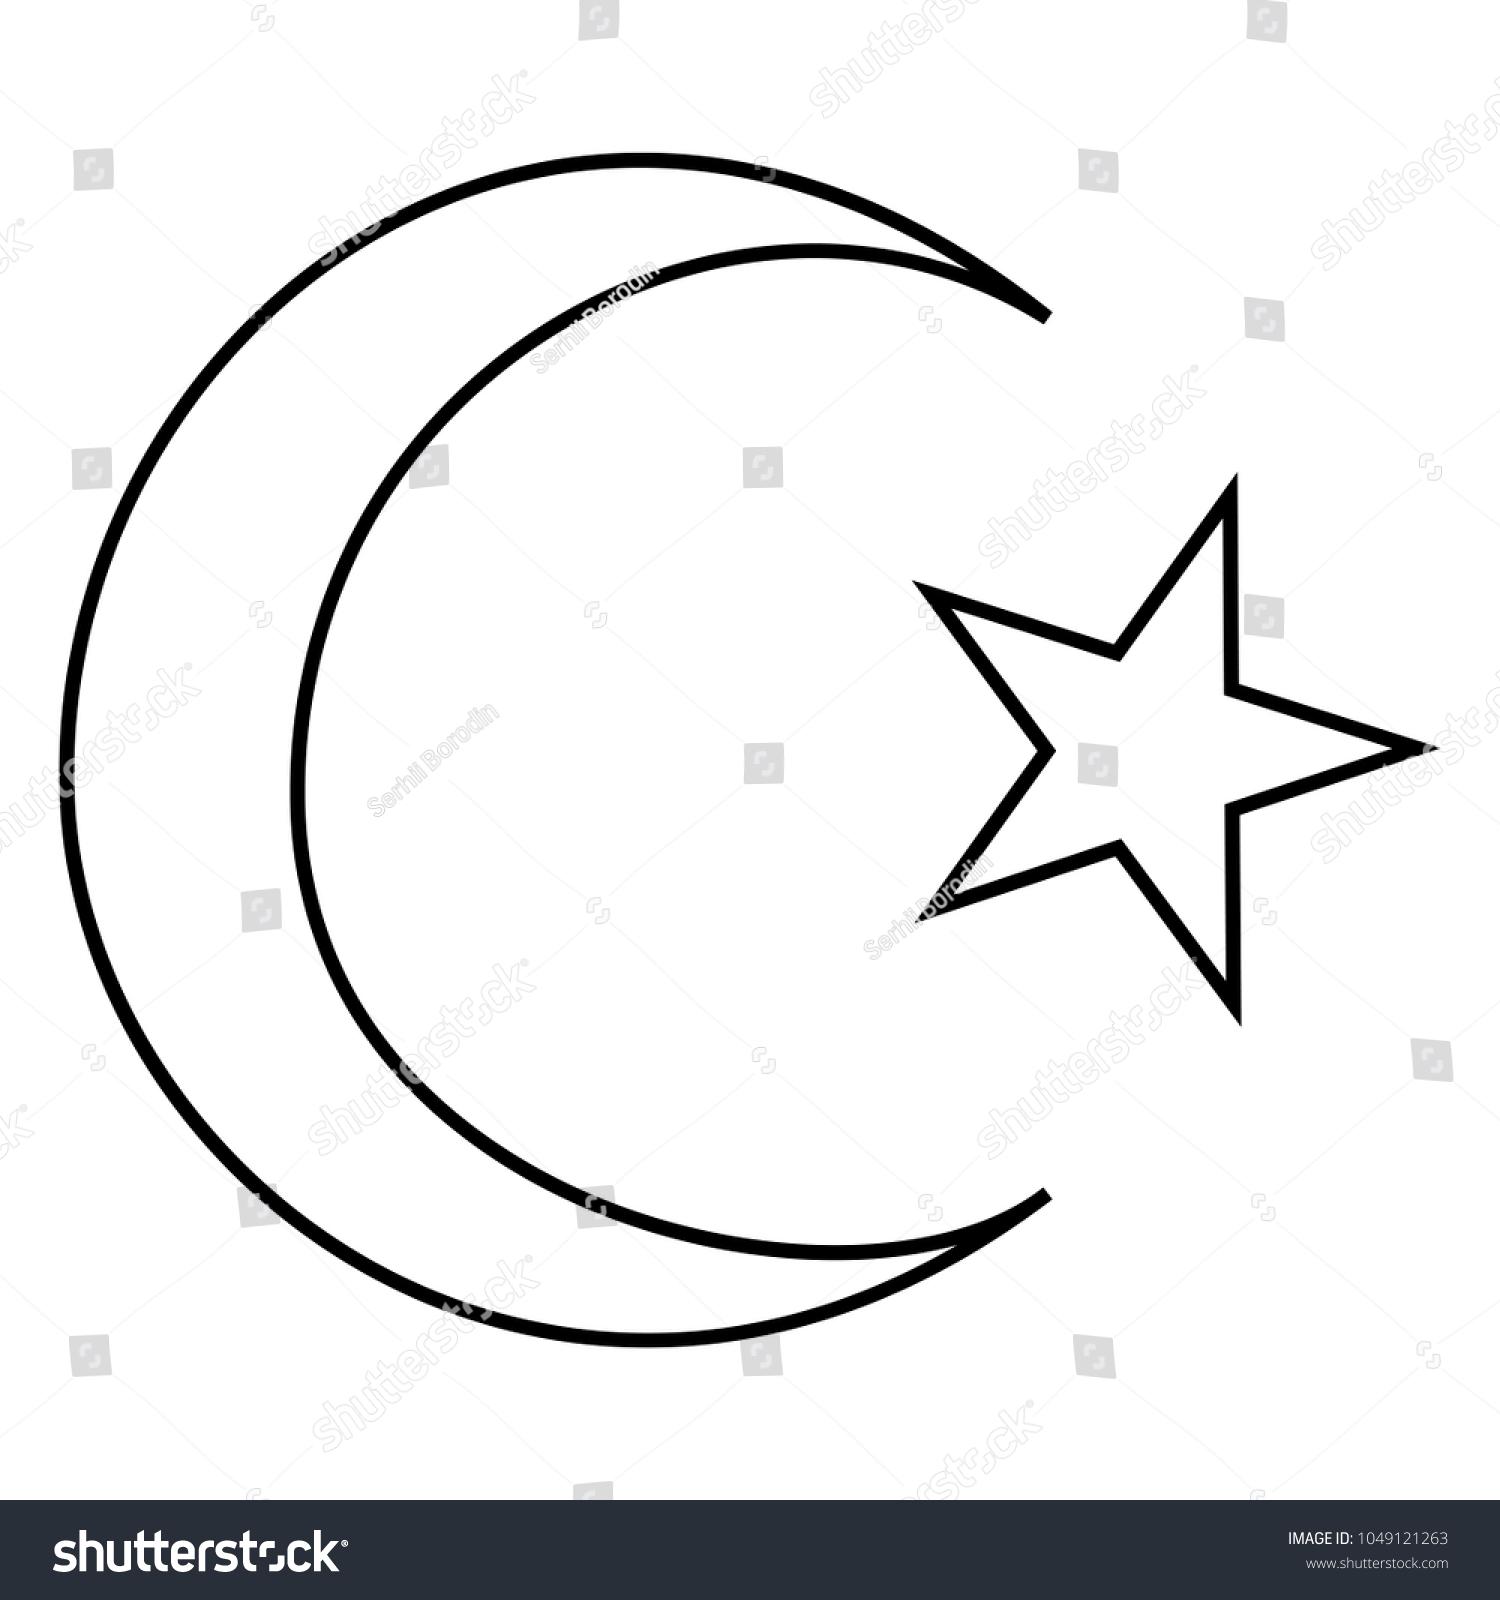 Symbol islam crescent star five corners stock vector 1049121263 symbol of islam crescent and star with five corners icon black color buycottarizona Gallery